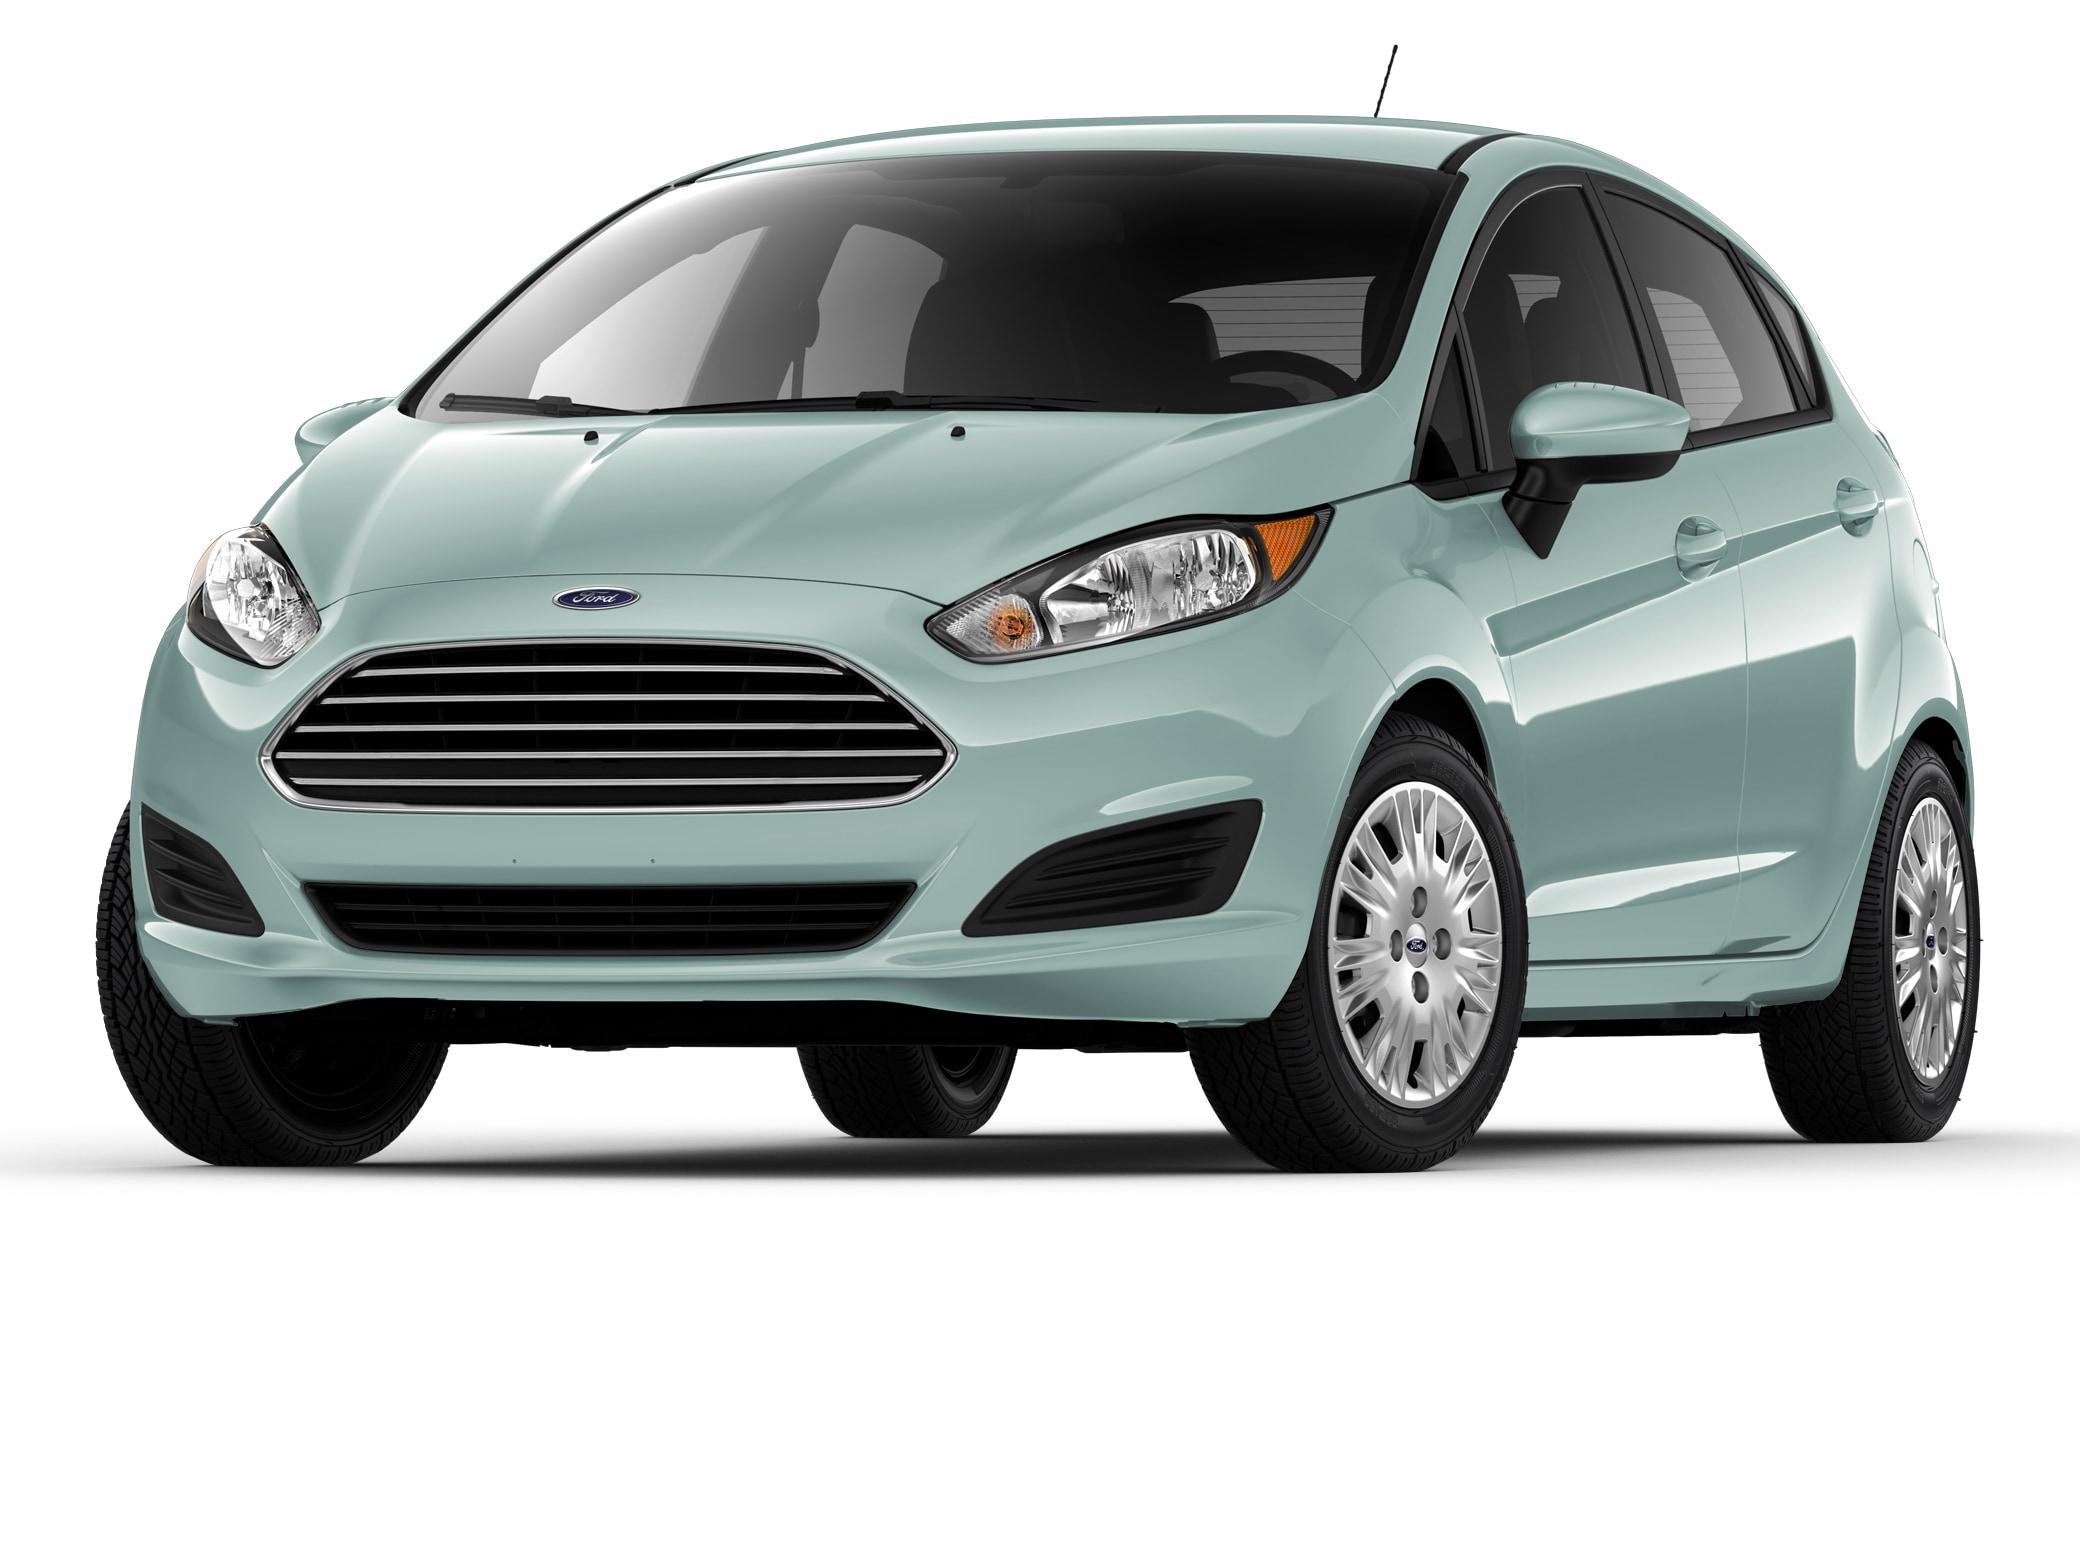 2019 Ford Fiesta Hatchback Digital Showroom | Woodhouse Ford